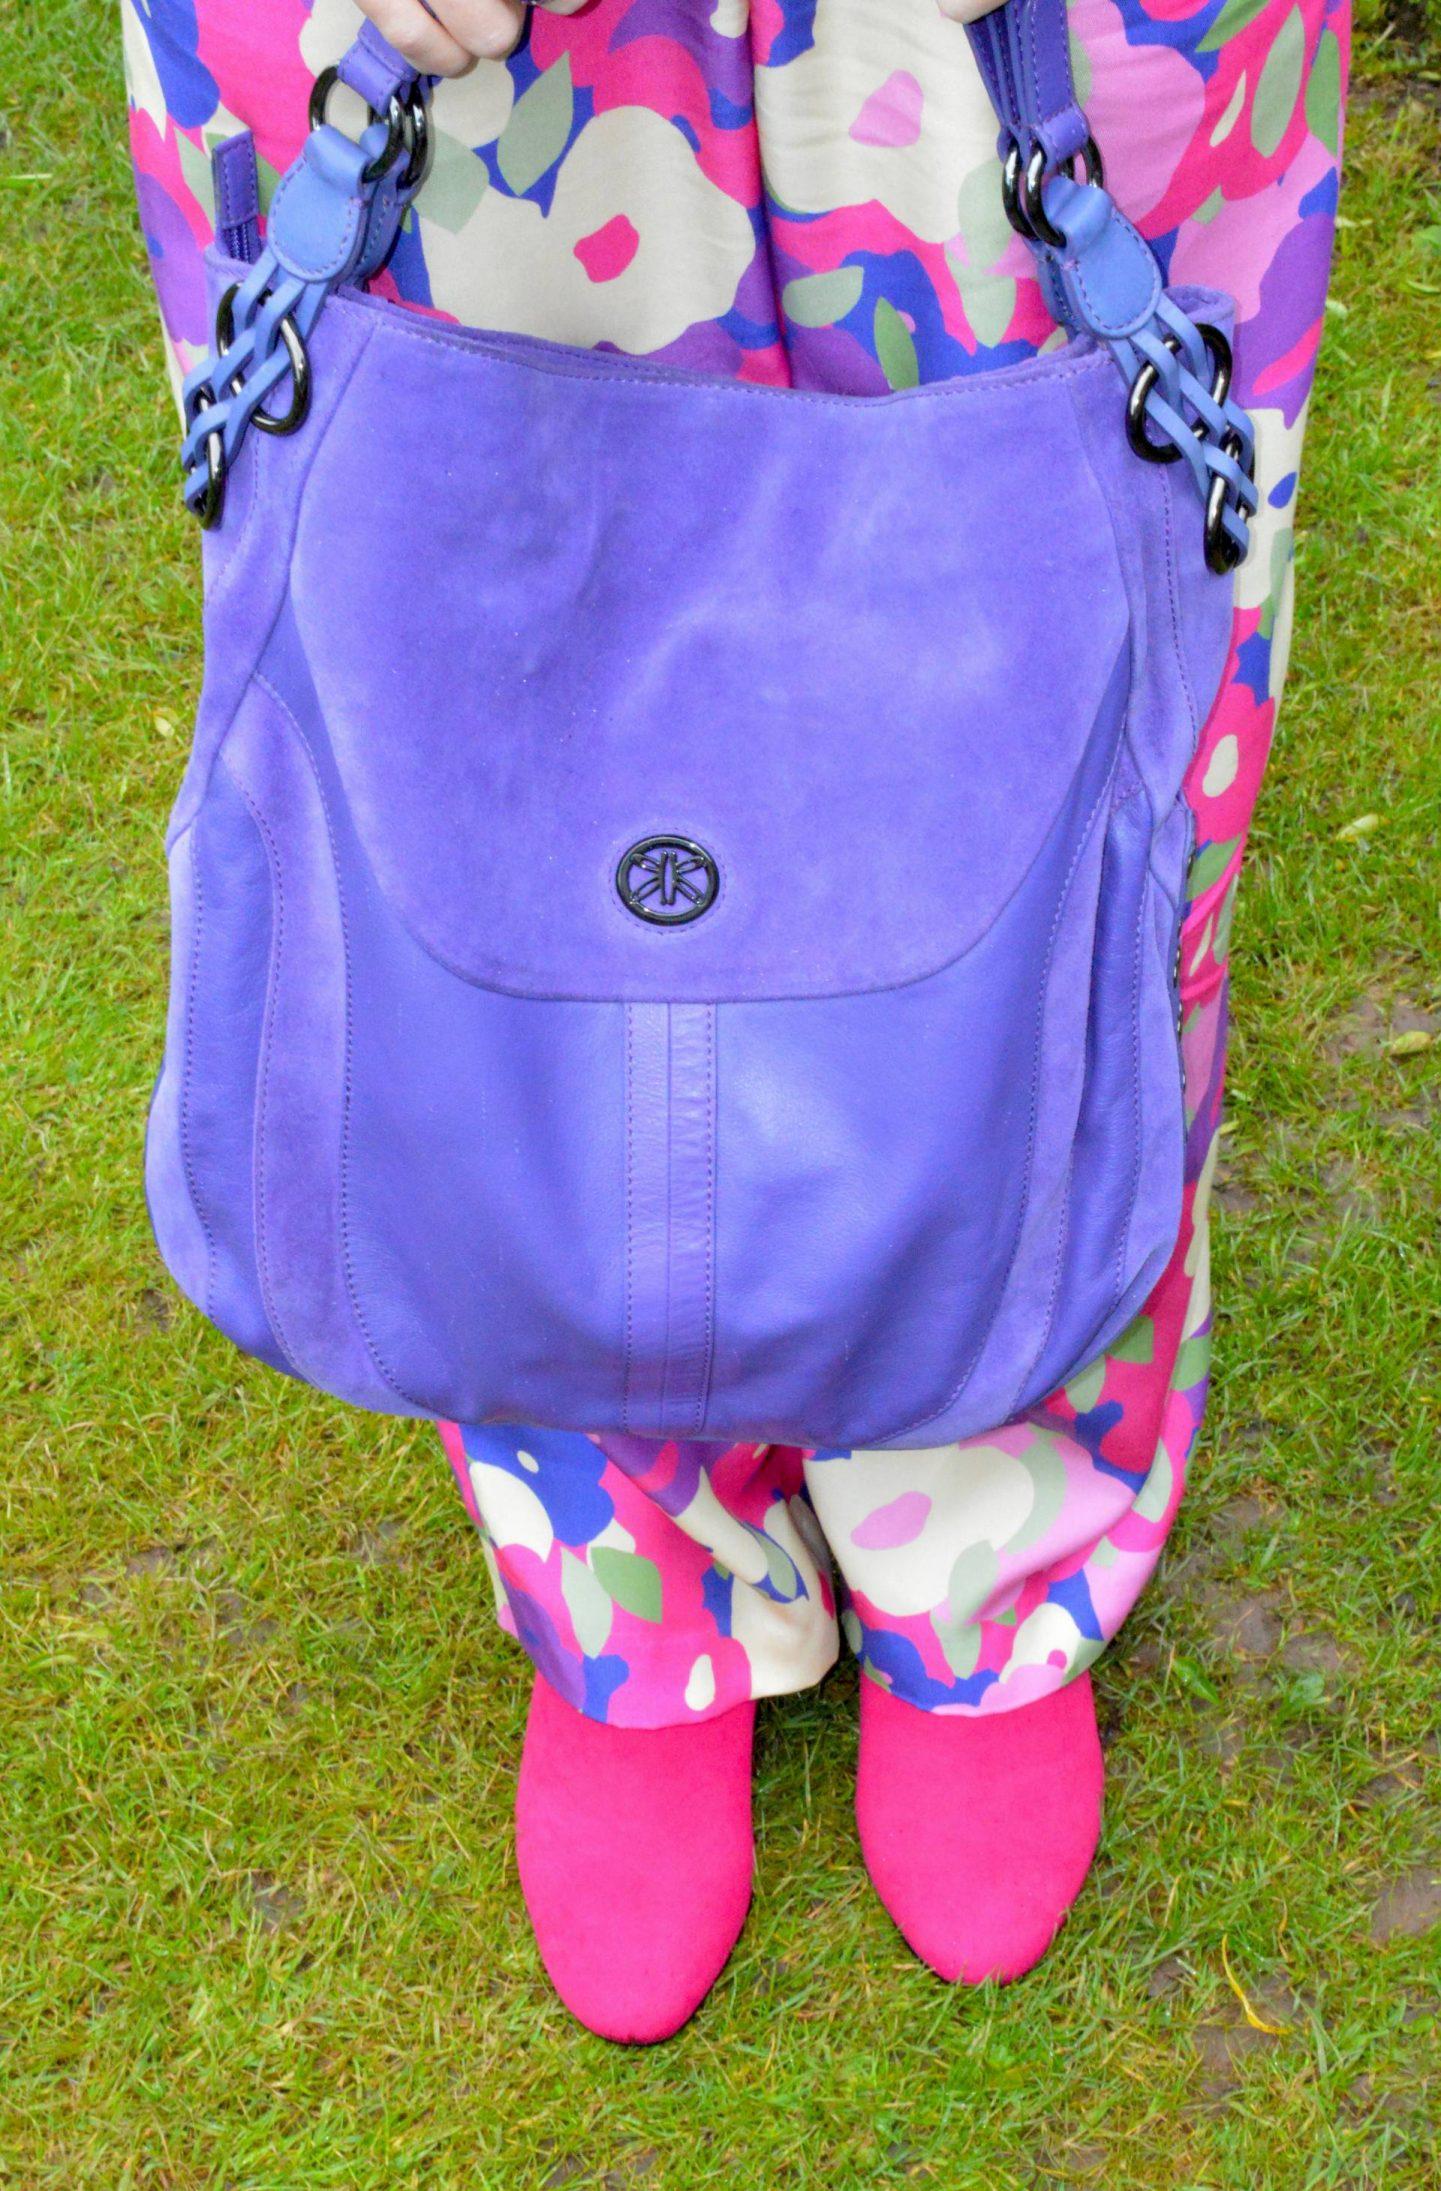 Ri2k purple bag